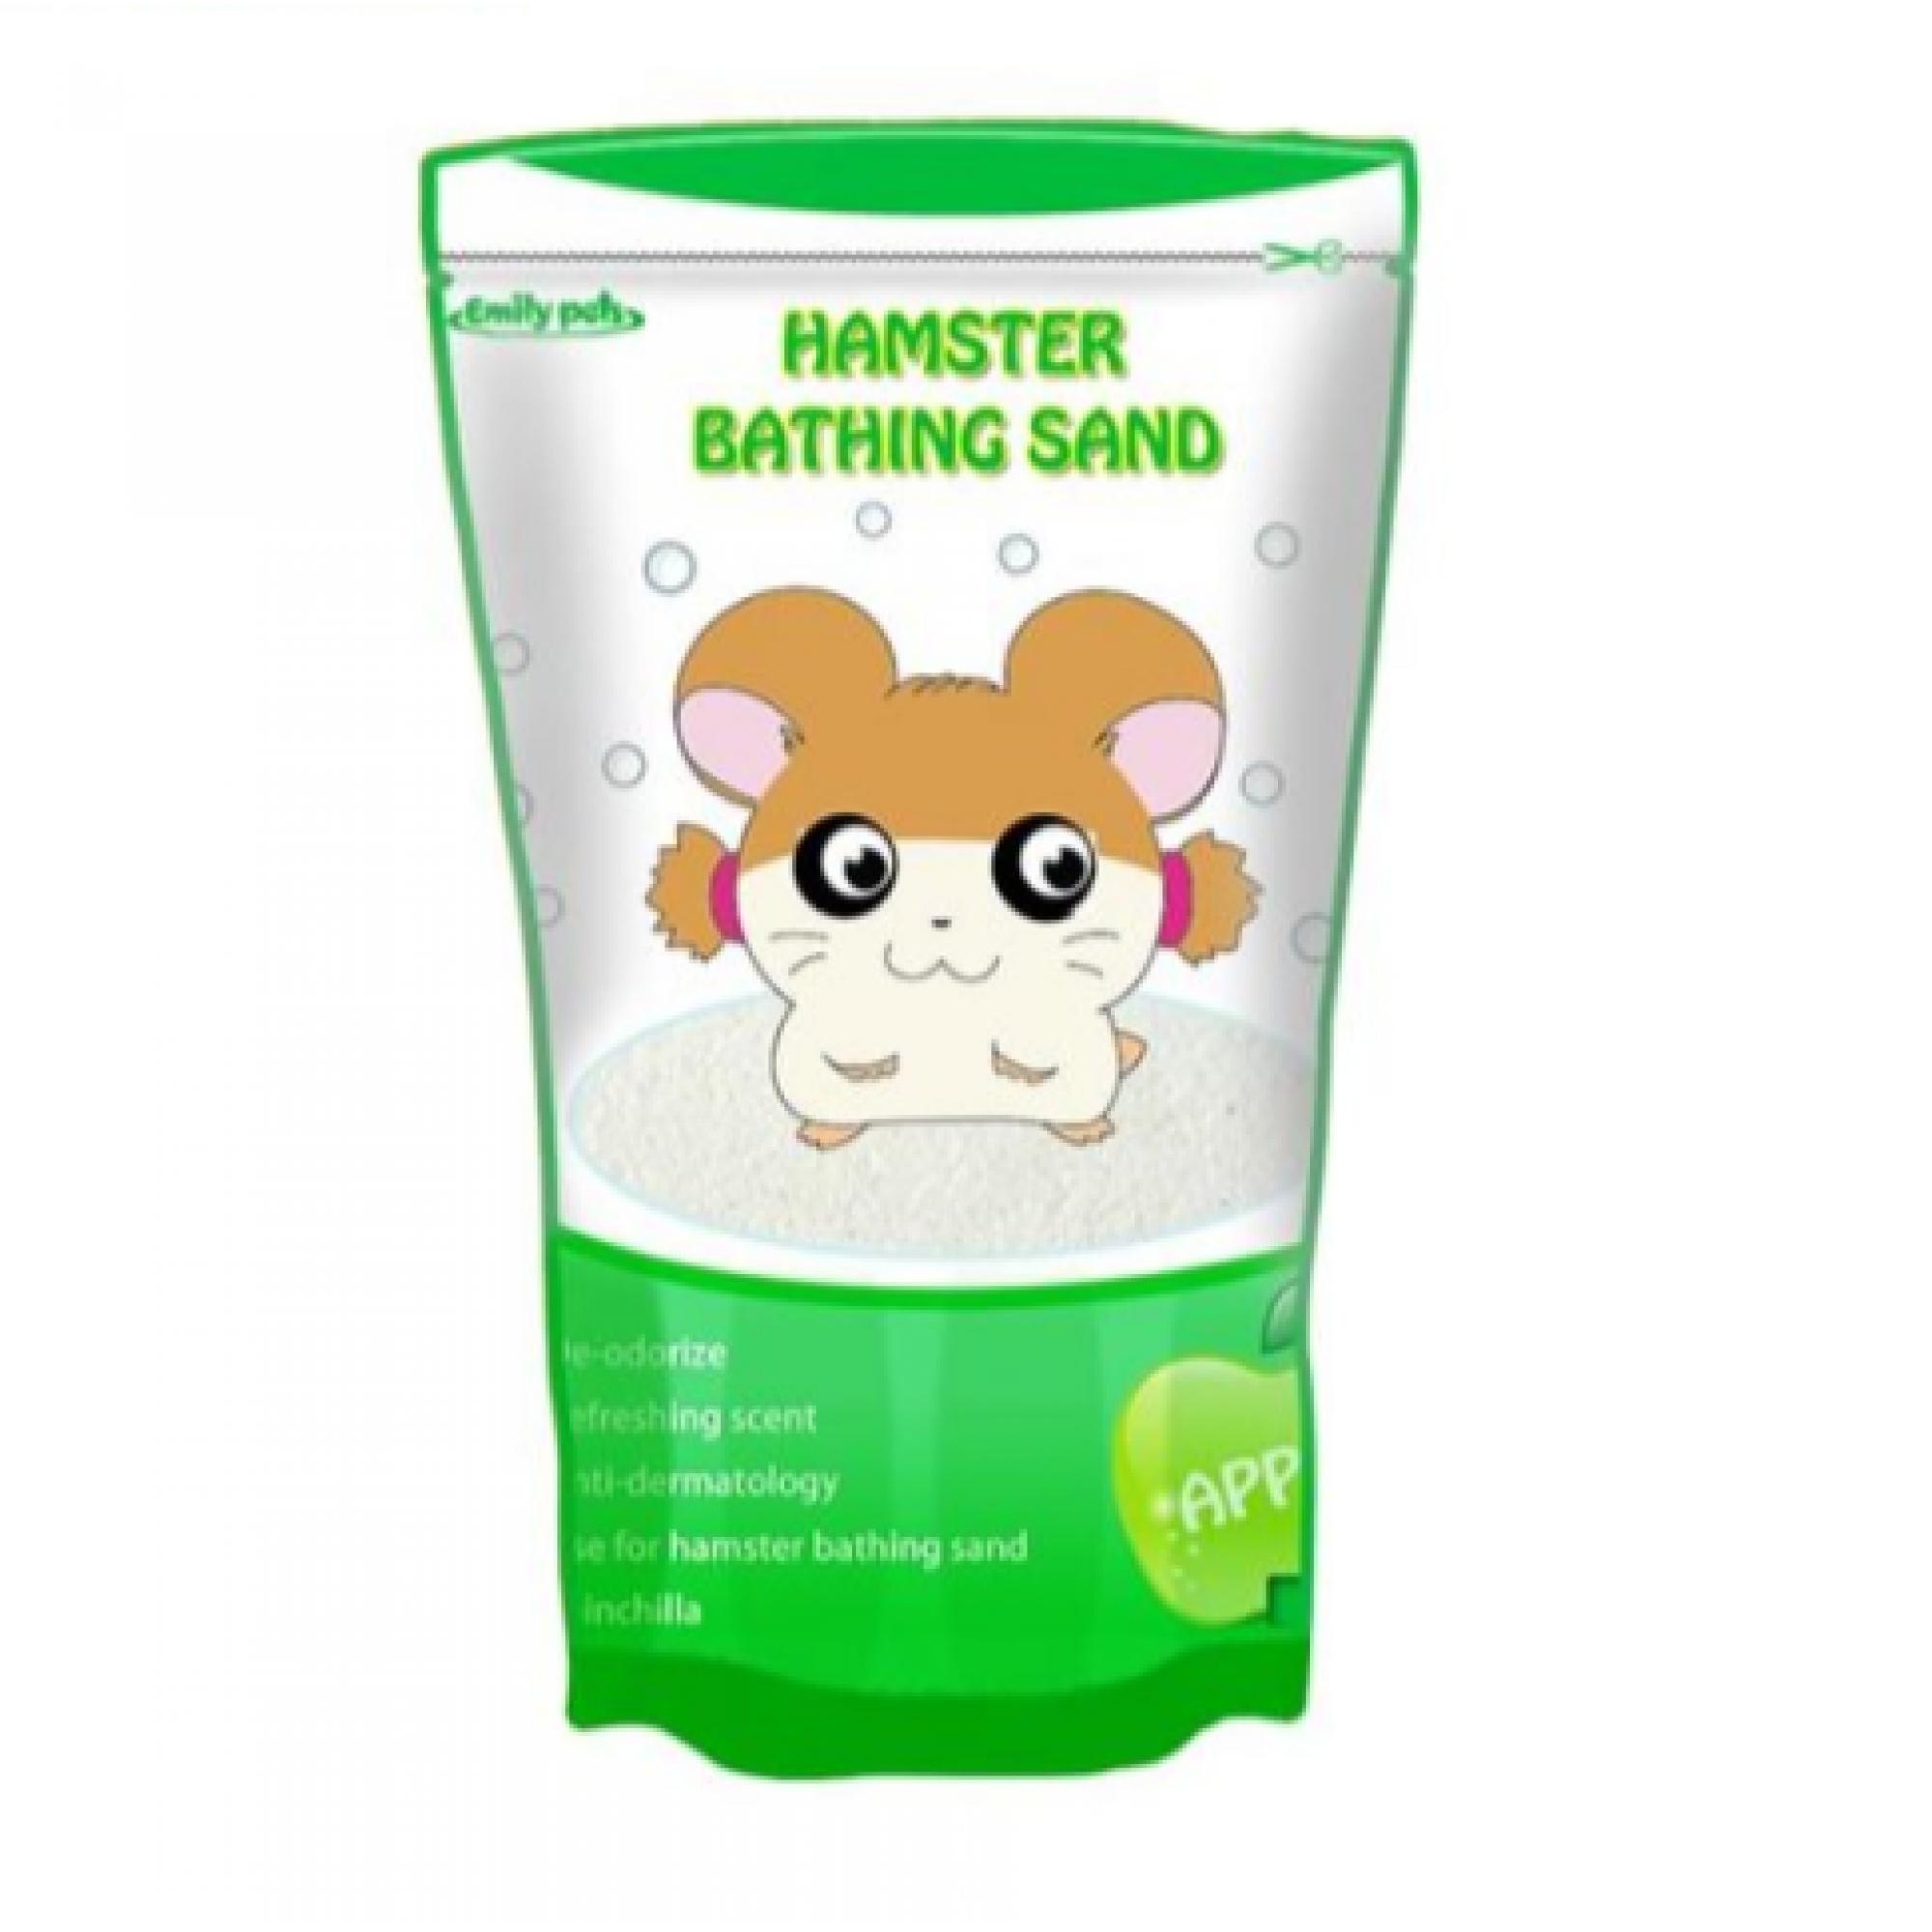 Emily Pets Hamster Bathing Sand Apple 1kg